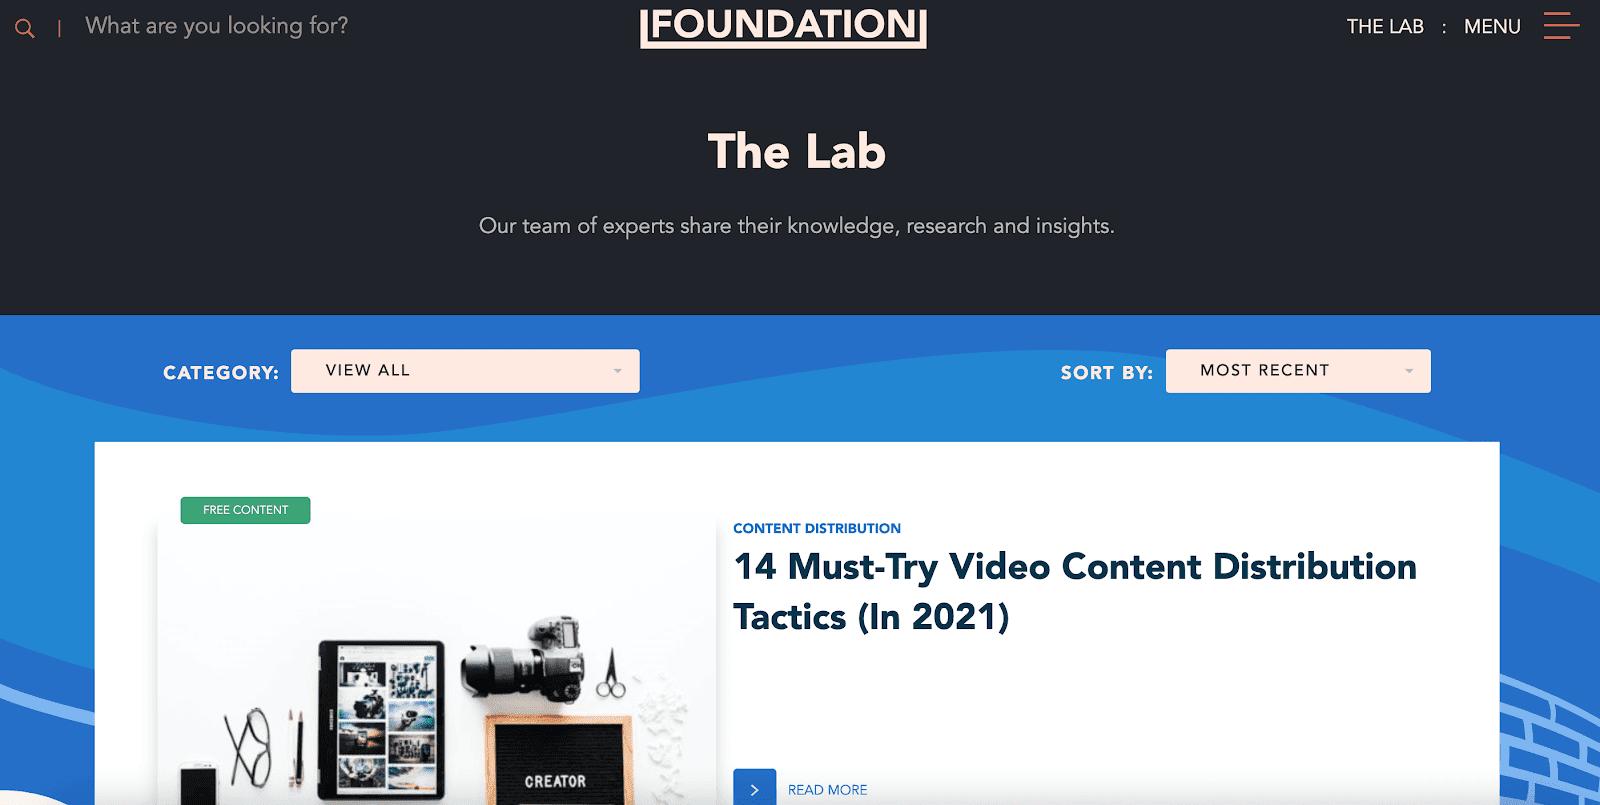 Foundation blog page